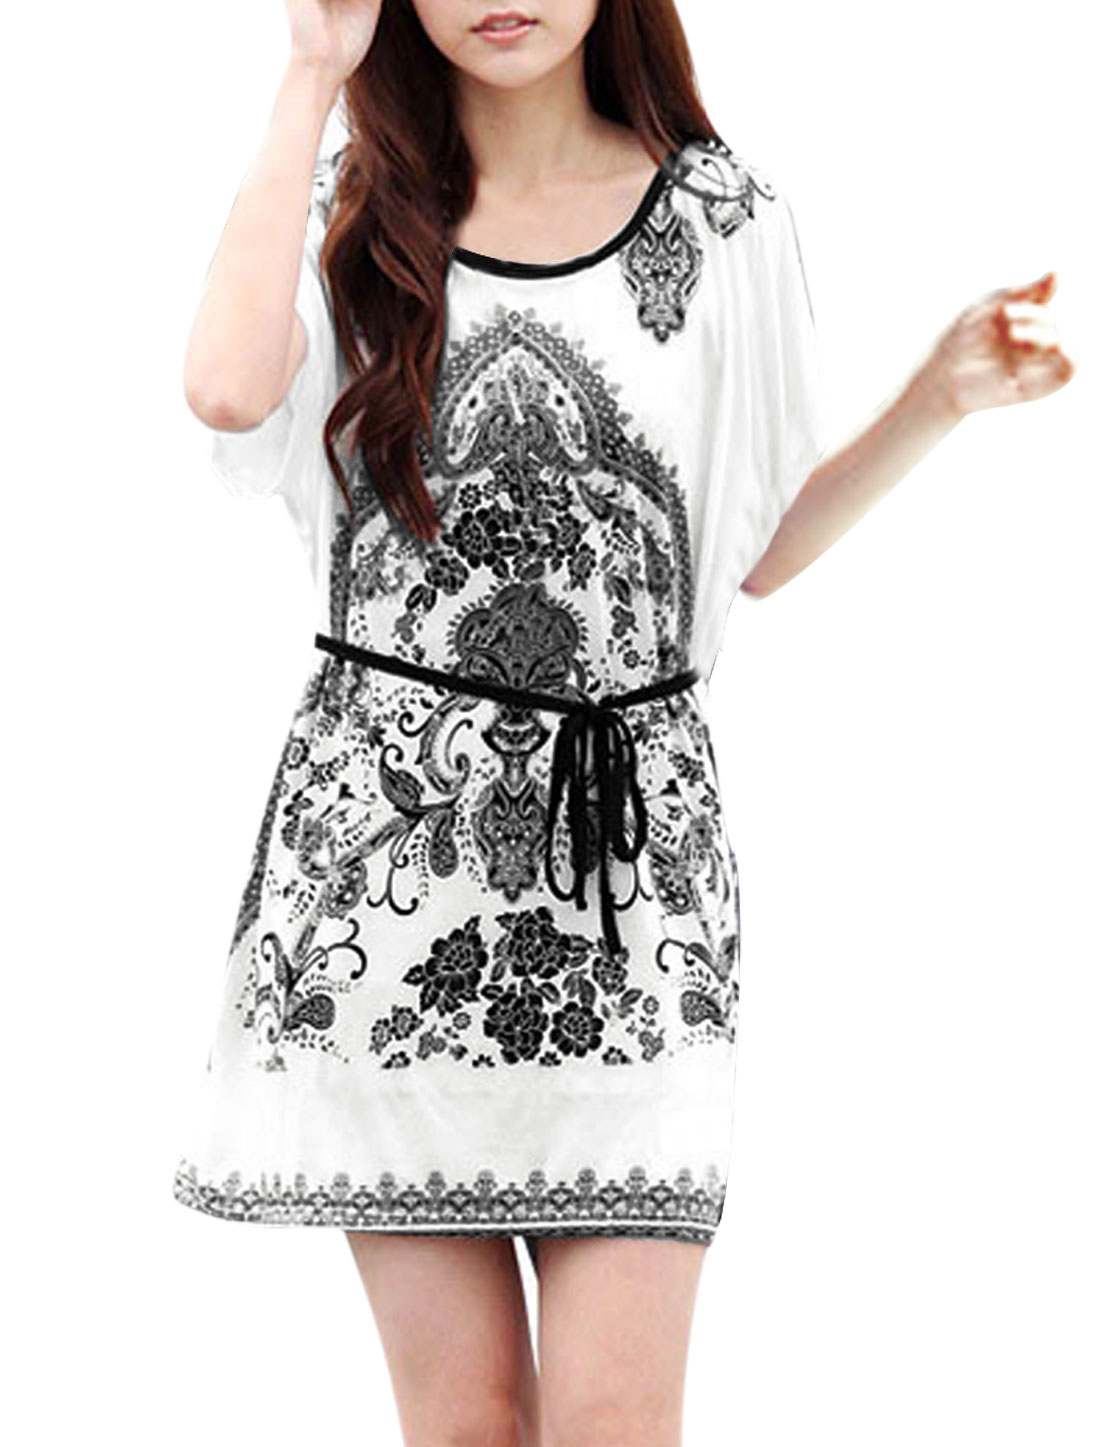 Ladies Short Sleeves Porcelain Prints Modern Tunic Shirts White M